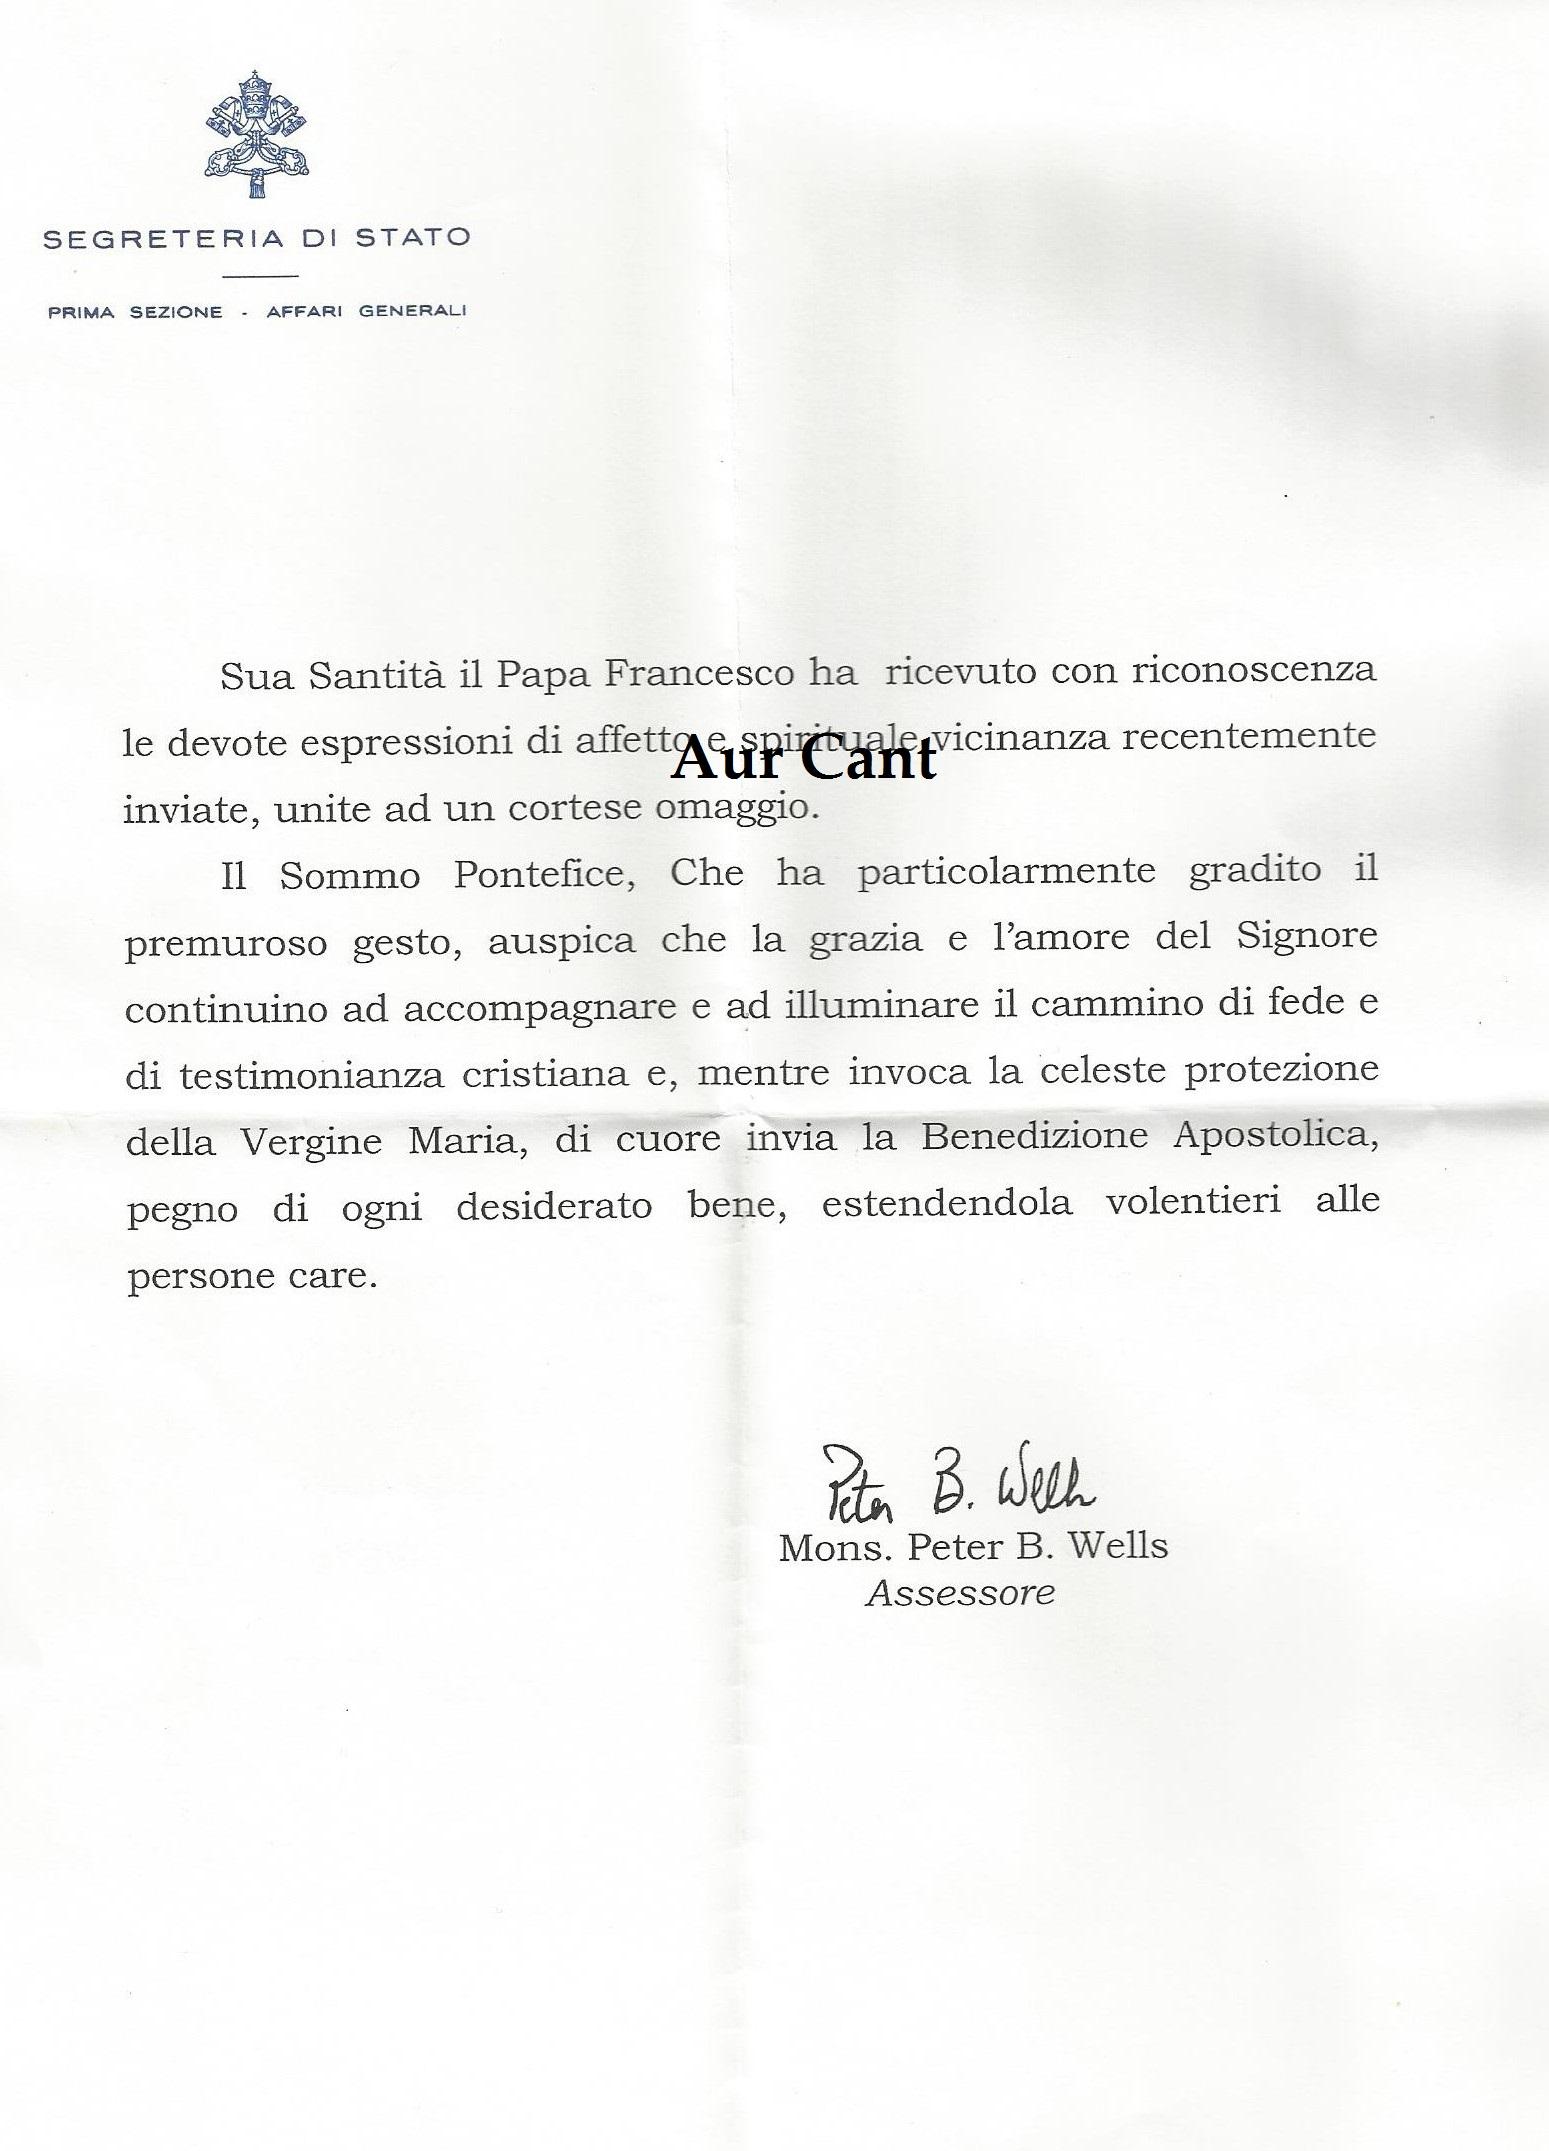 Una lettera da Papa Francesco